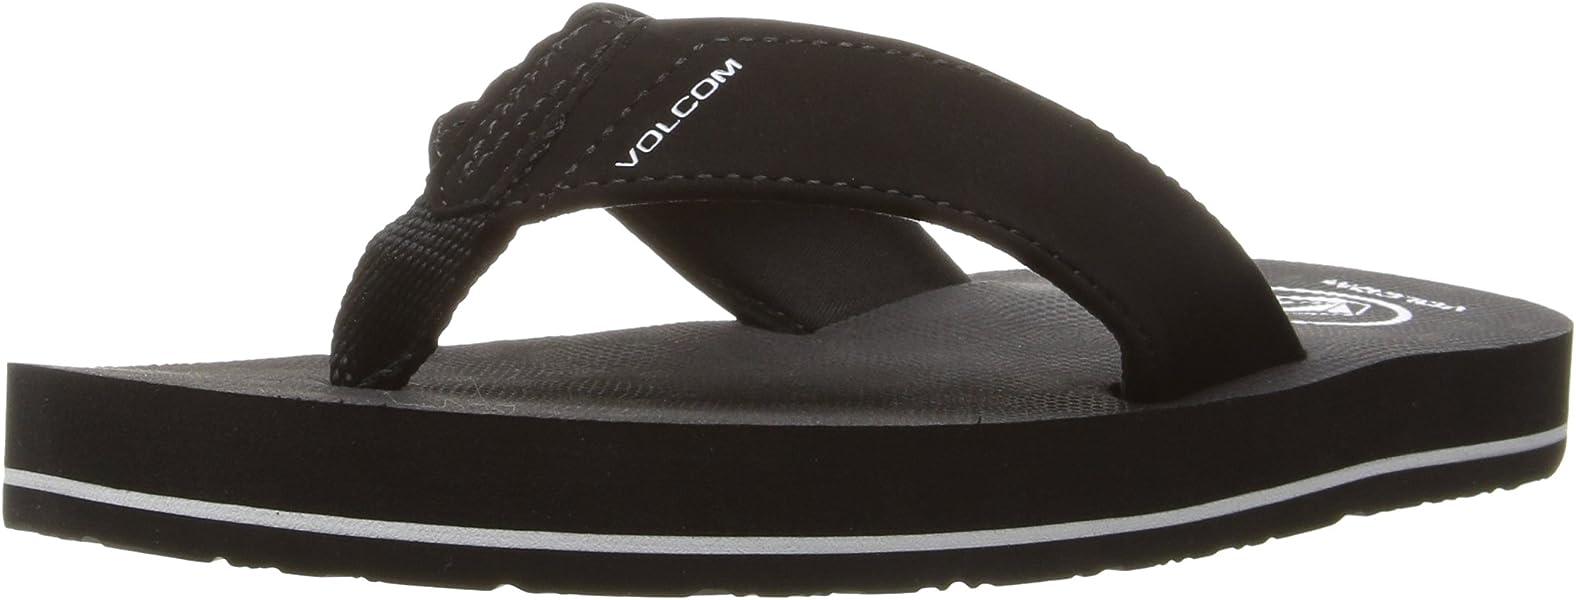 3bd595c73 Volcom Boys  Victor Big Youth FLIP Flop Sandal